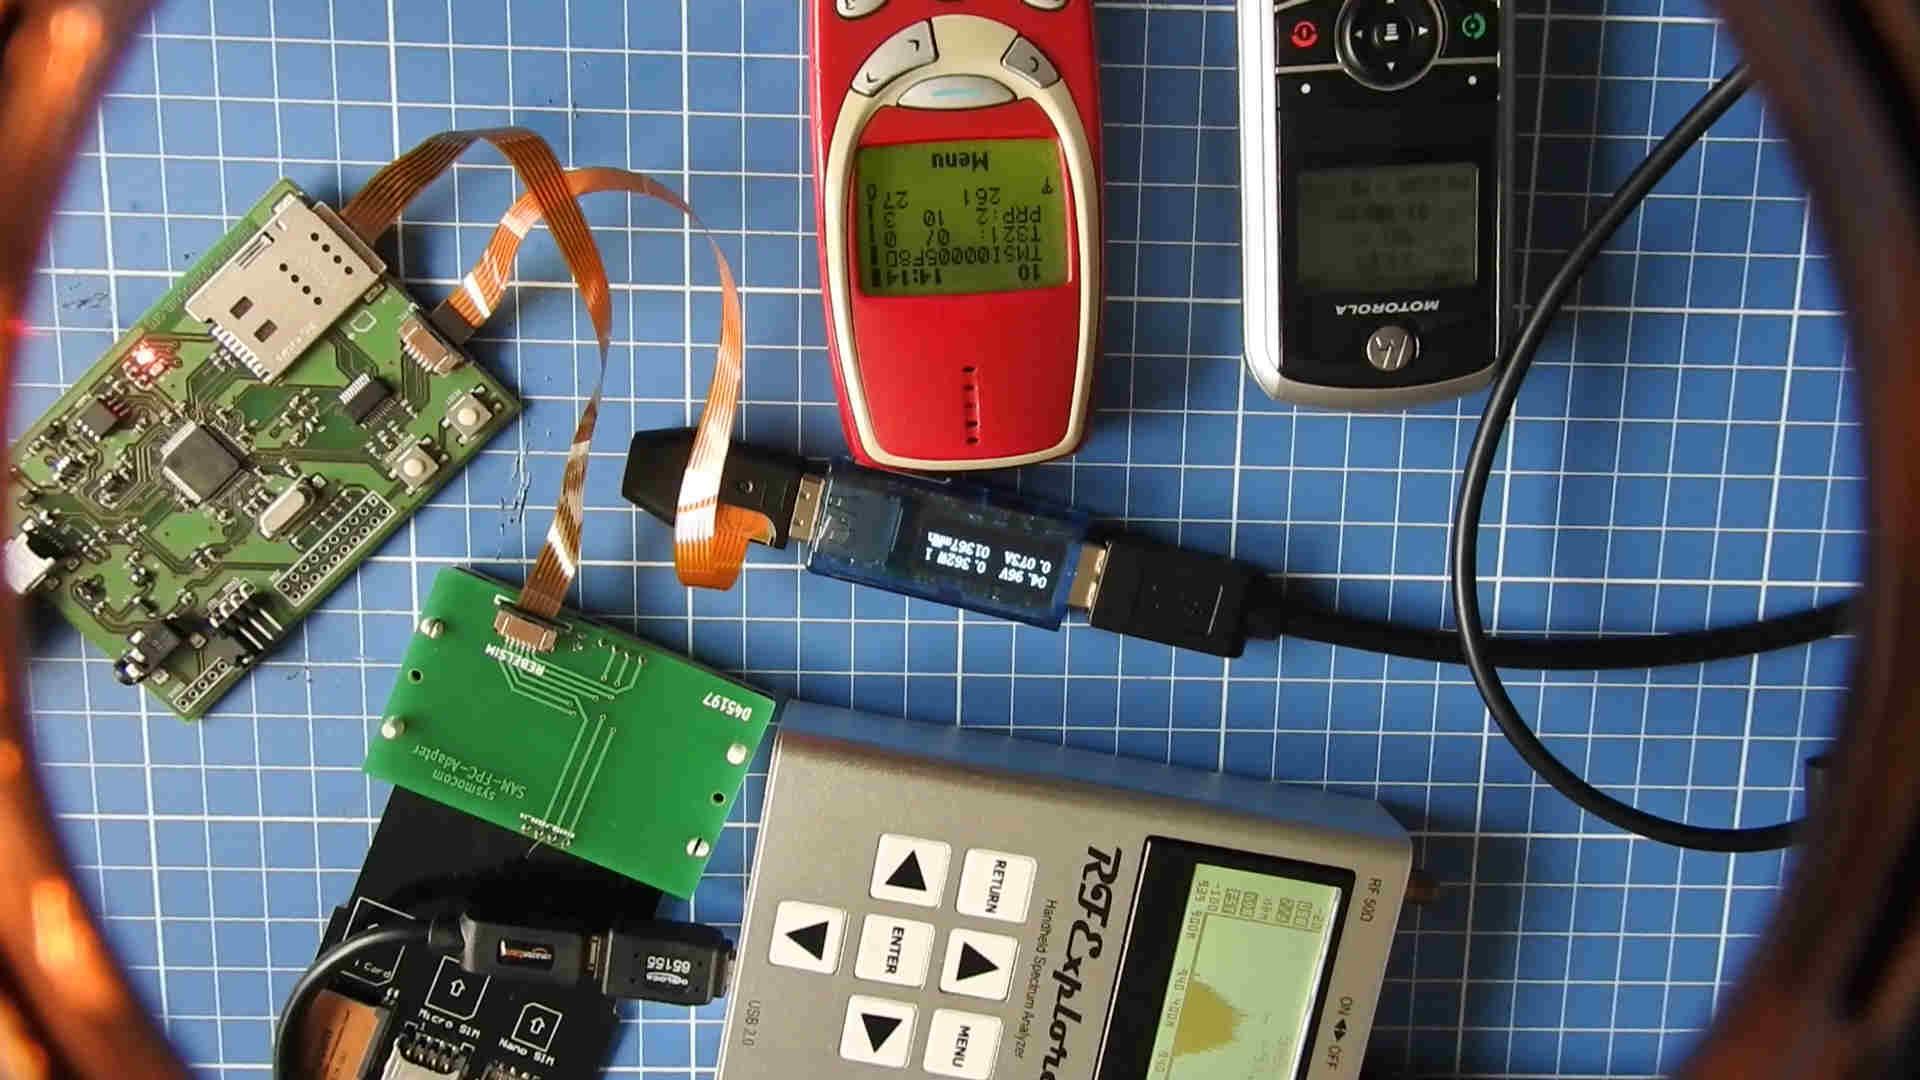 Inside a low budget consumer hardware espionage implant